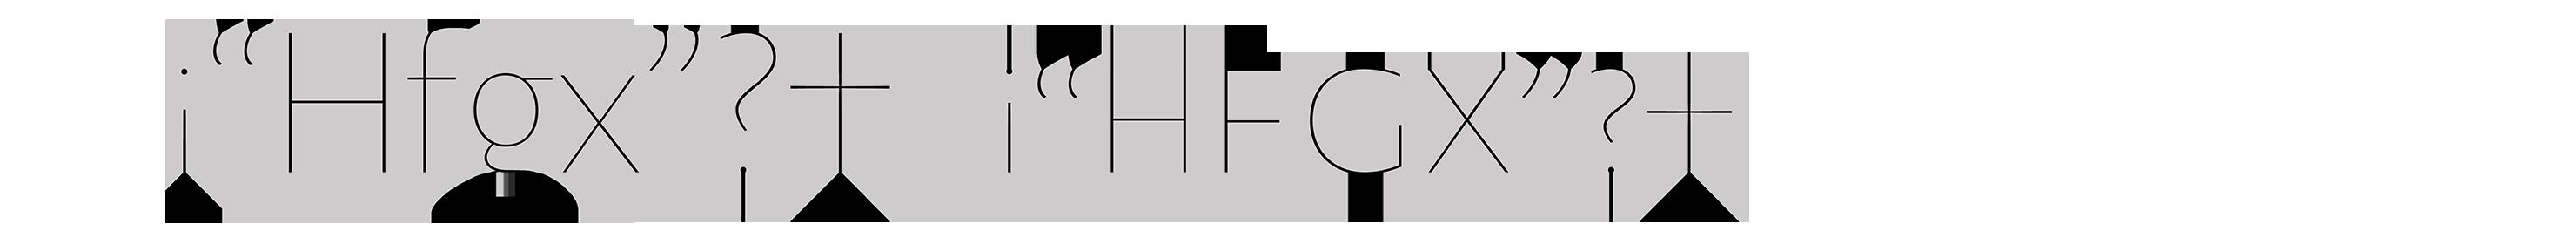 Typeface-Novel-Sans-Hairline-F01-Atlas-Font-Foundry